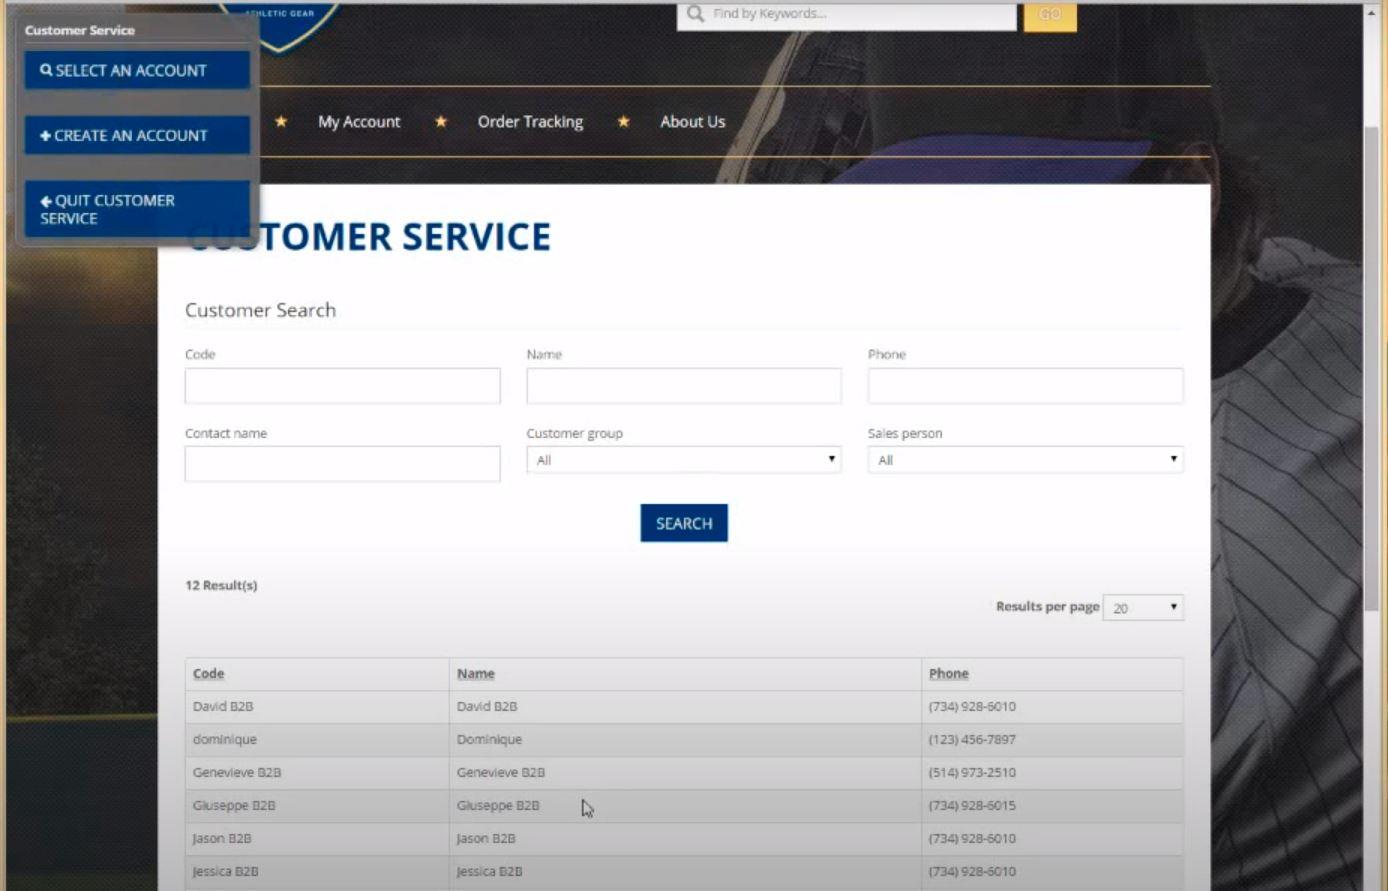 k-eCommerce Software - k-eCommerce customer service management